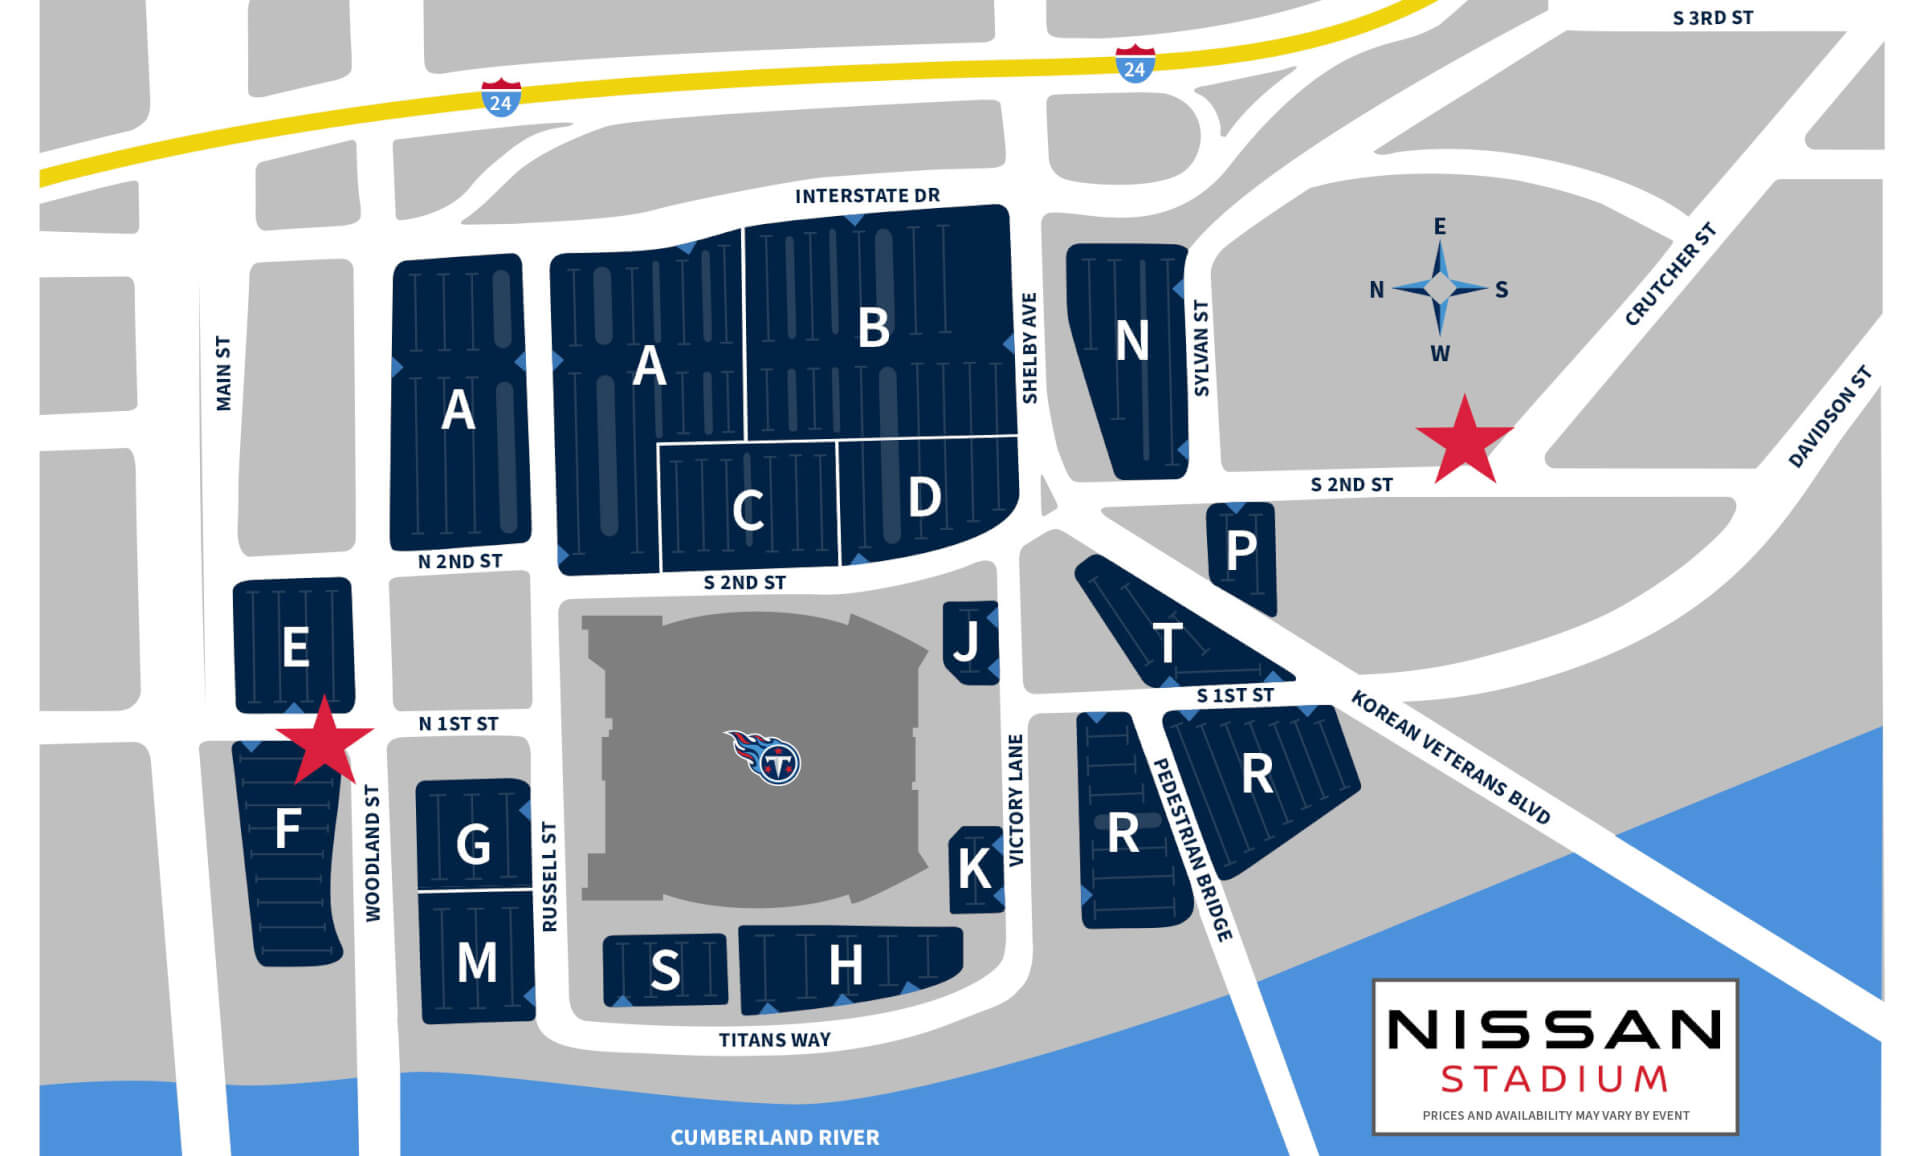 Nissan Stadium Parking and Rideshare